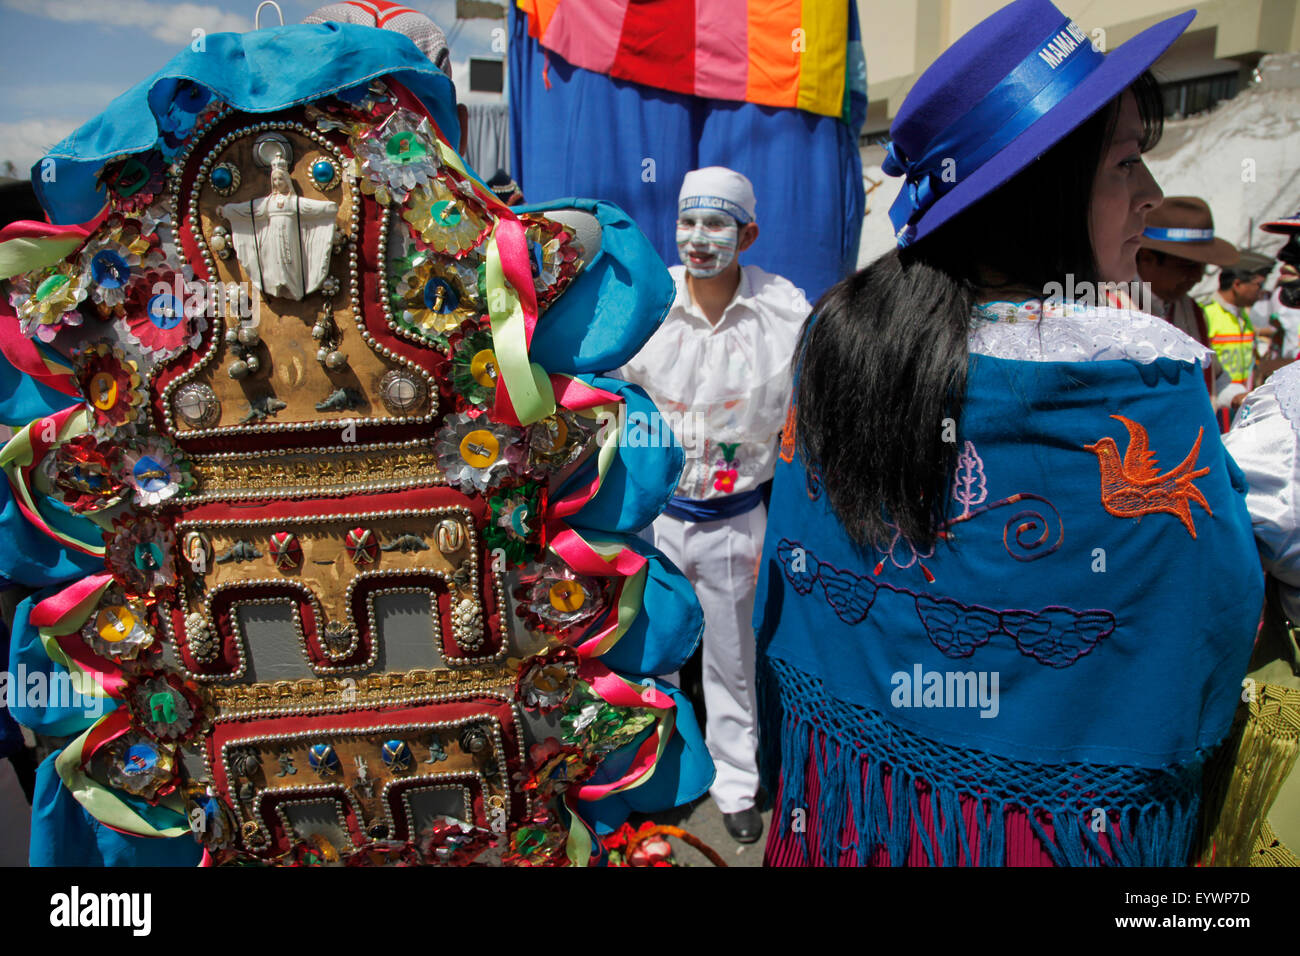 Tradicional fiesta de la Mama Negra en Latacunga, Ecuador, Sudamérica Imagen De Stock